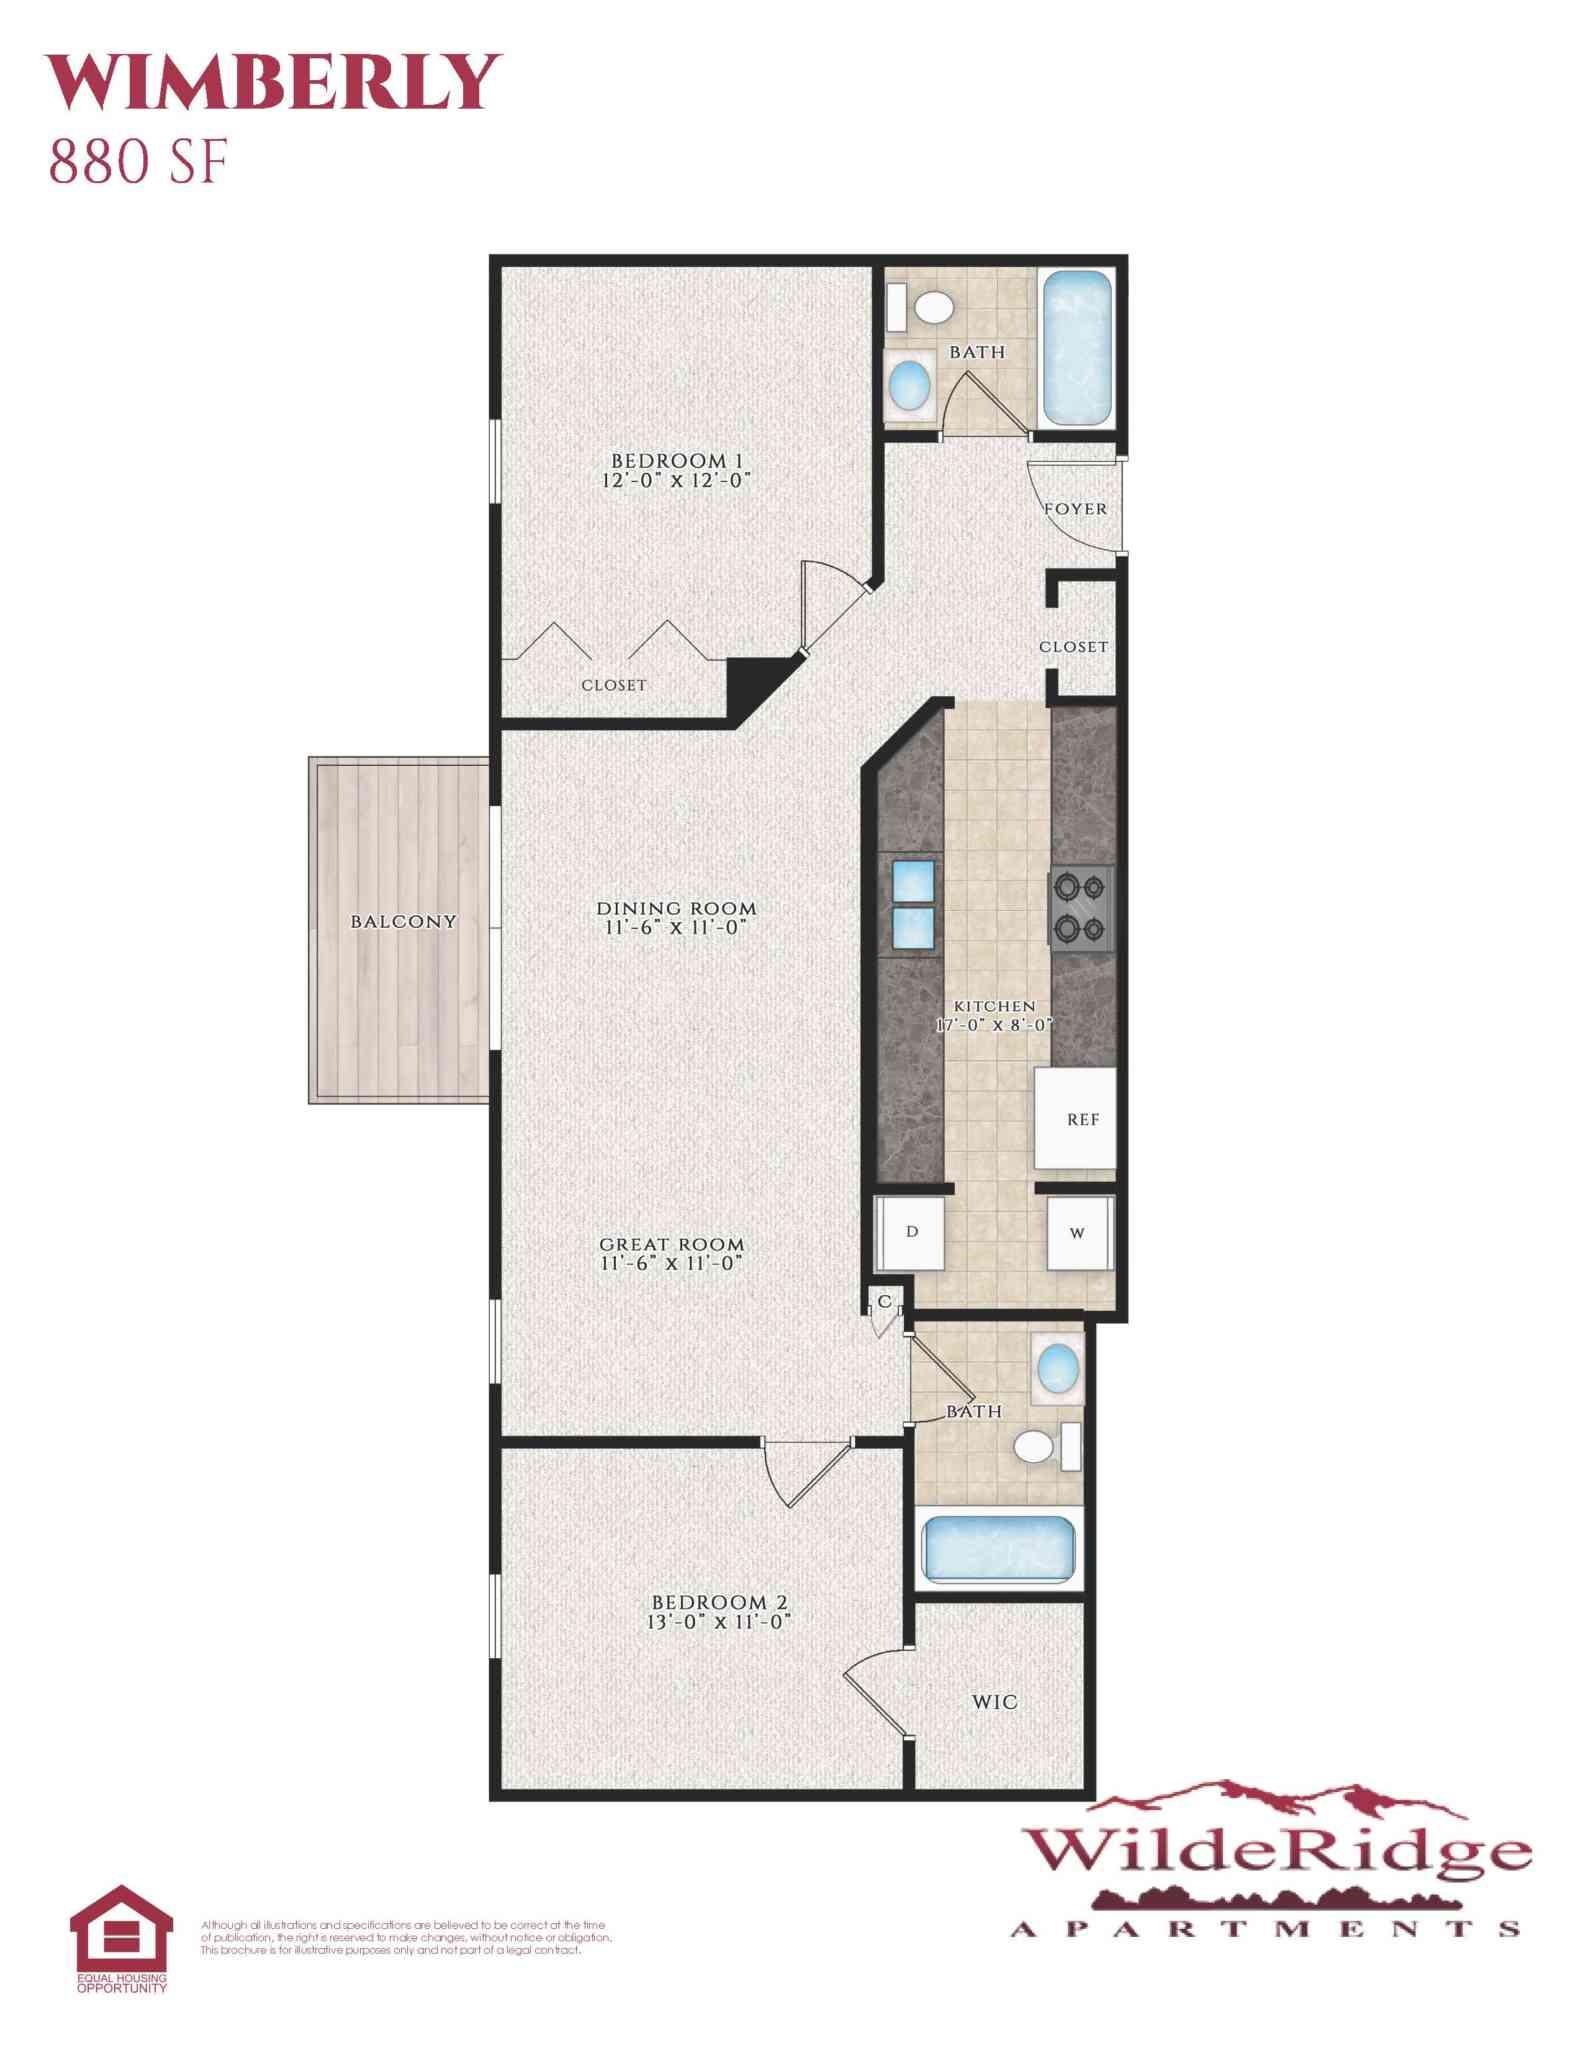 The Wimberly Floor Plan